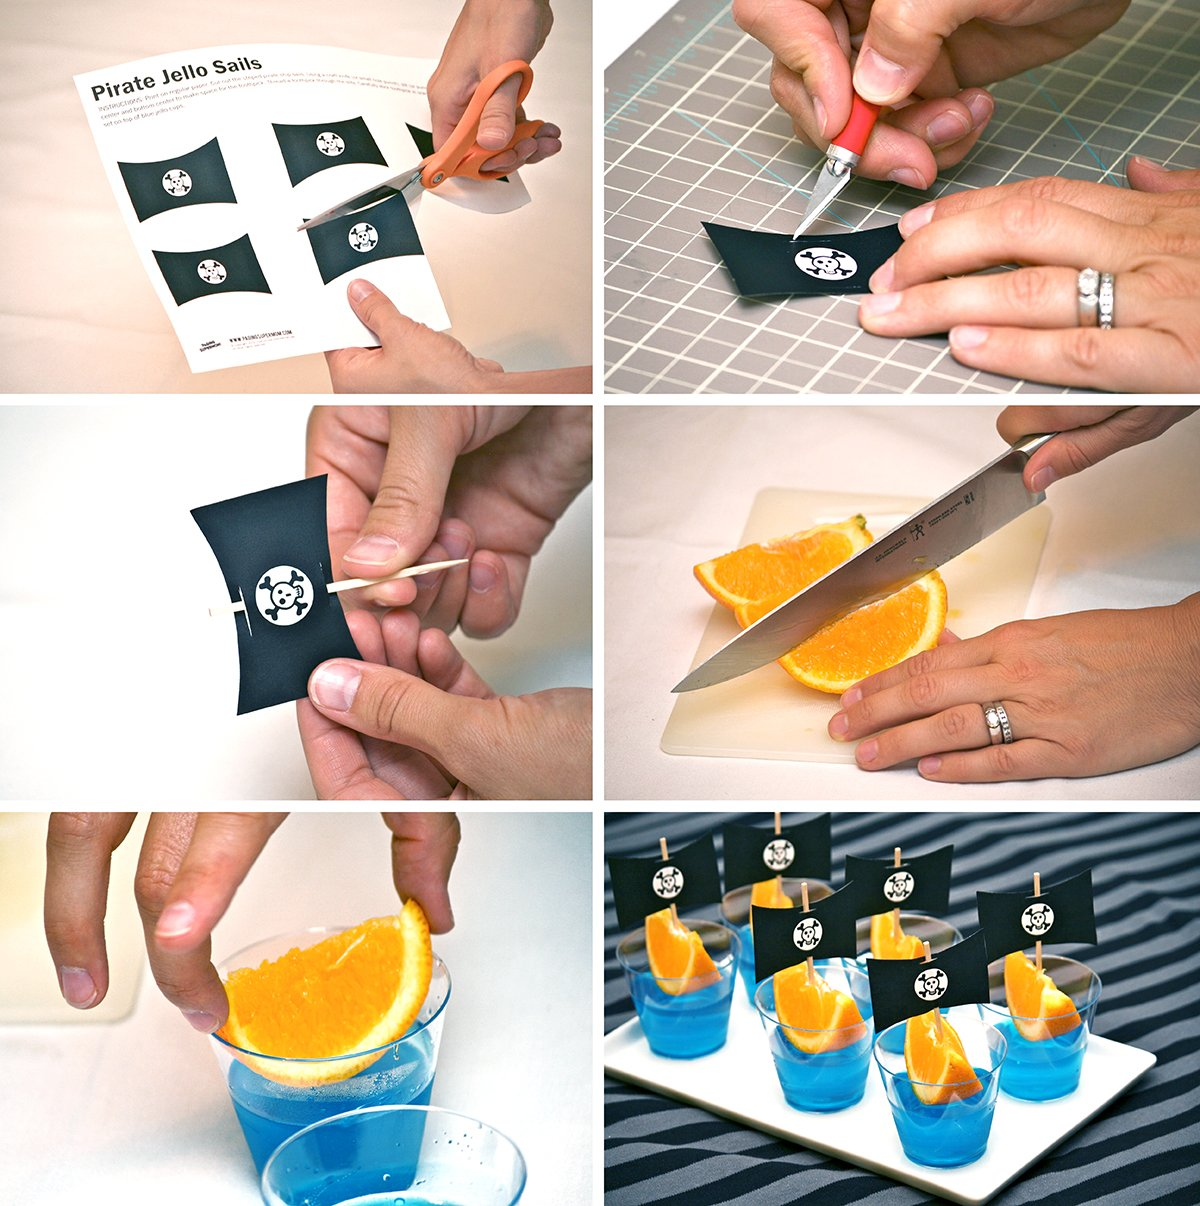 Pirate Party Food Ideas including FREE printable templates via @PagingSupermom